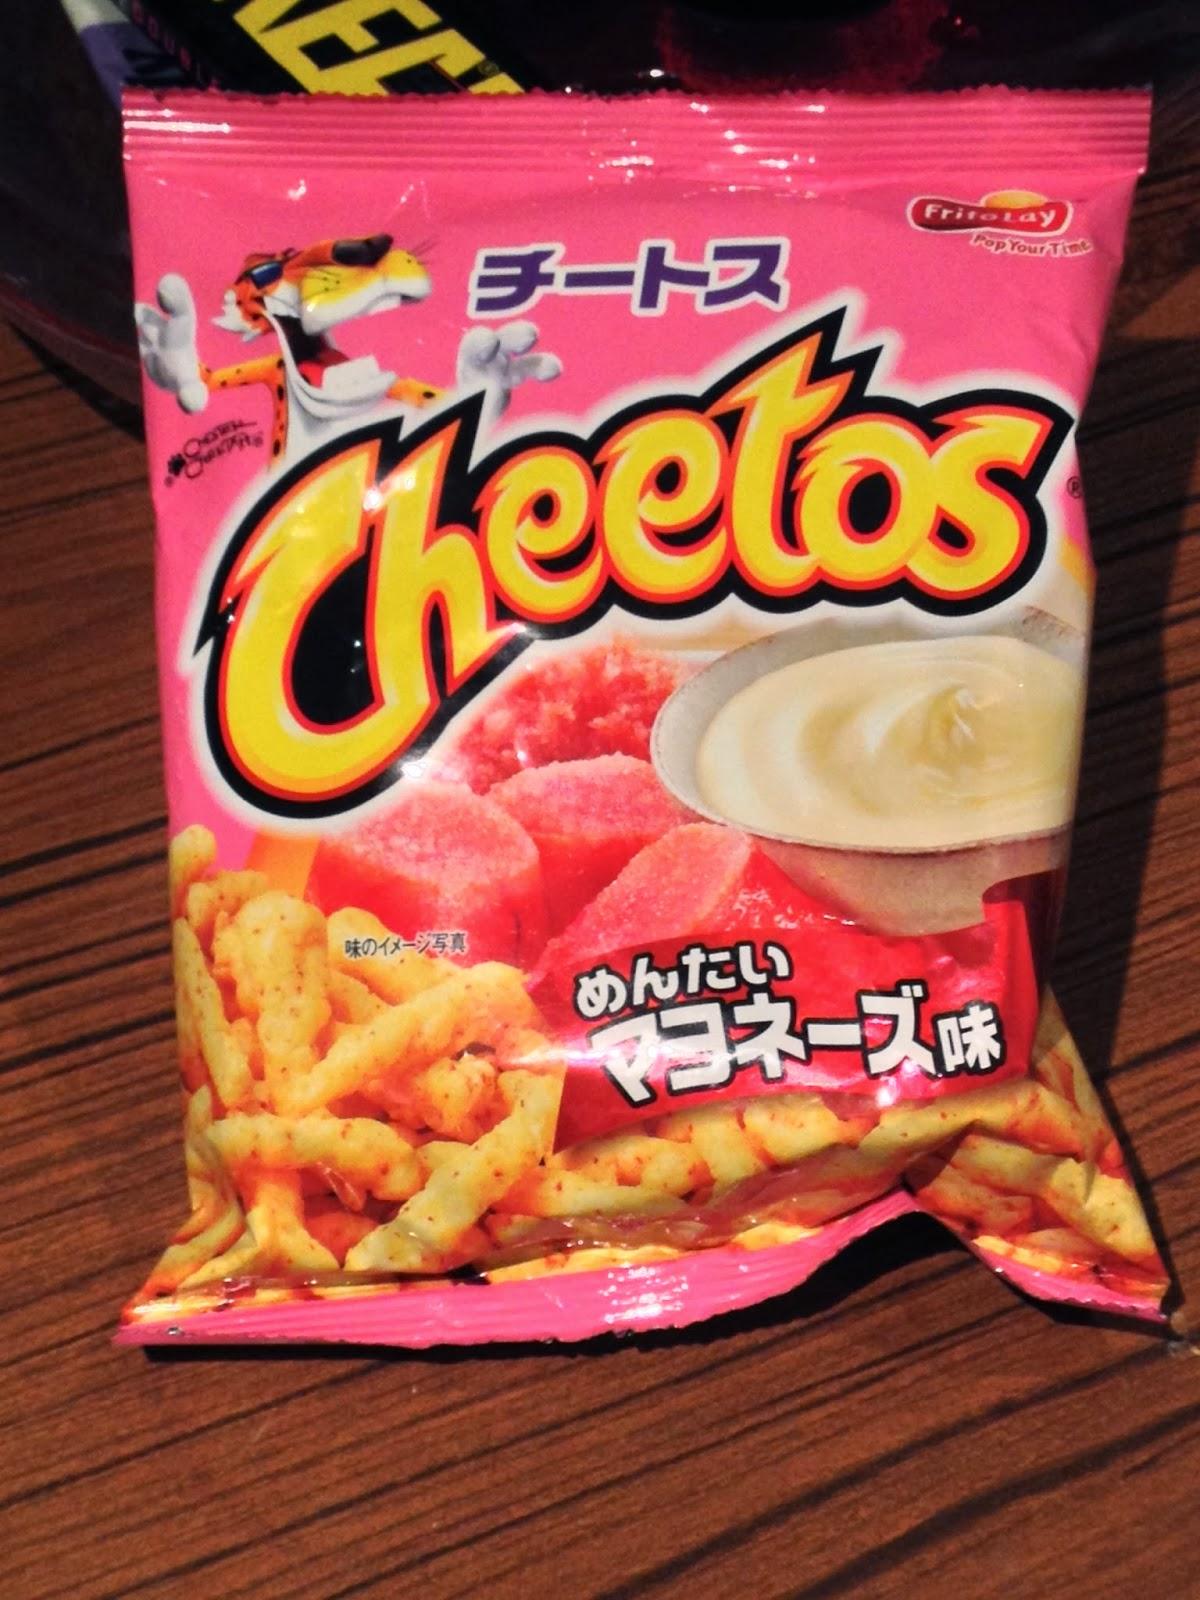 Creamy Steaks: Mentai Mayo Cheetos